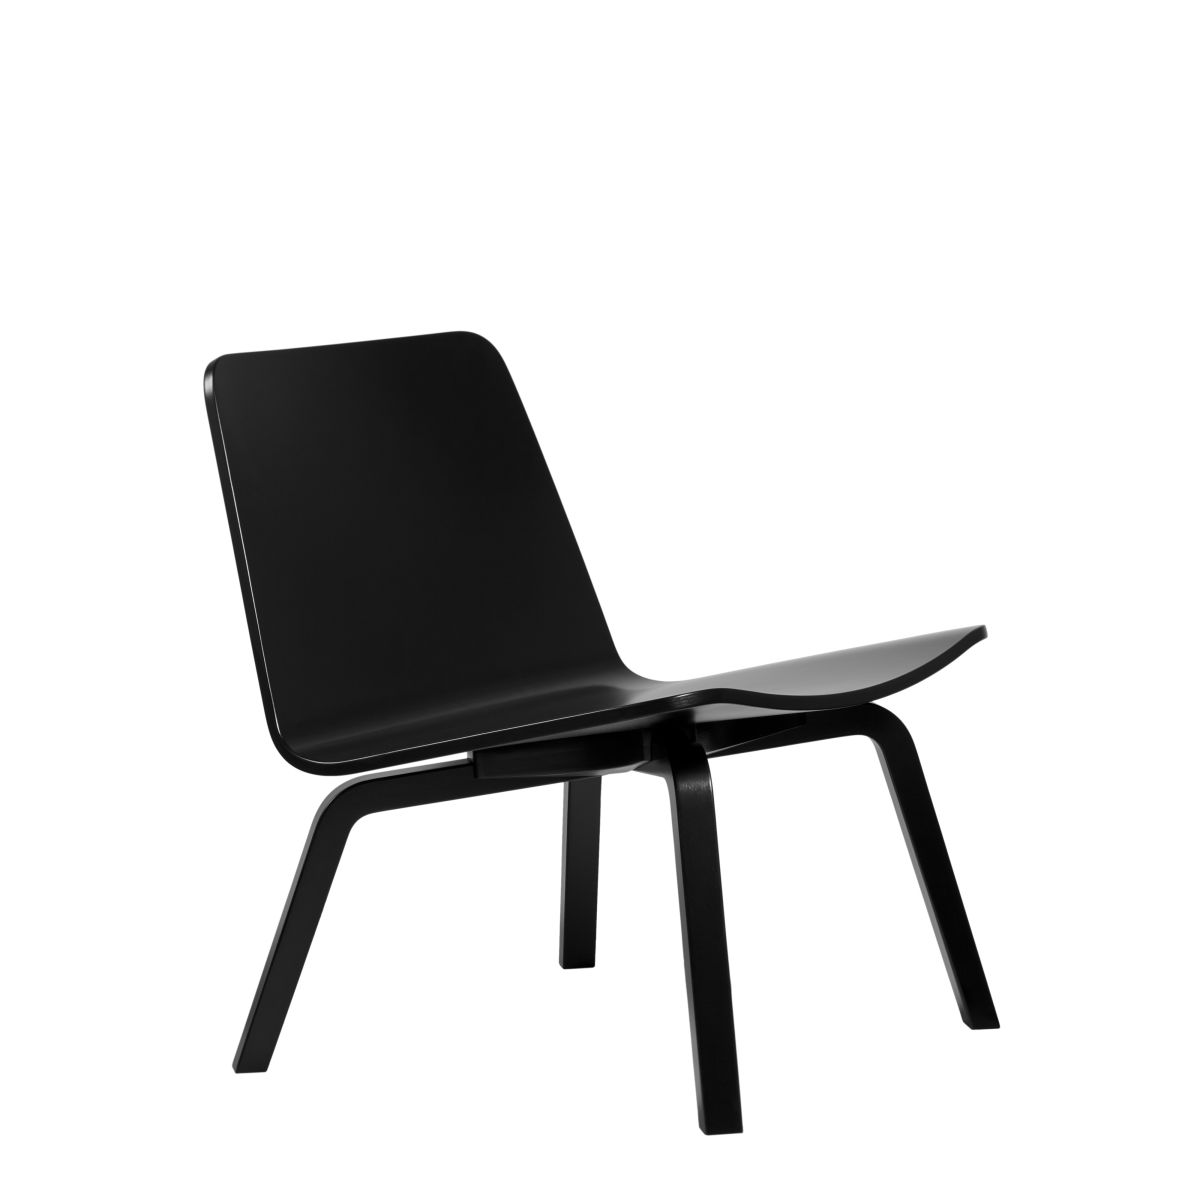 Lounge-Chair-Hk002-Black-Lacquer_Web-1977278